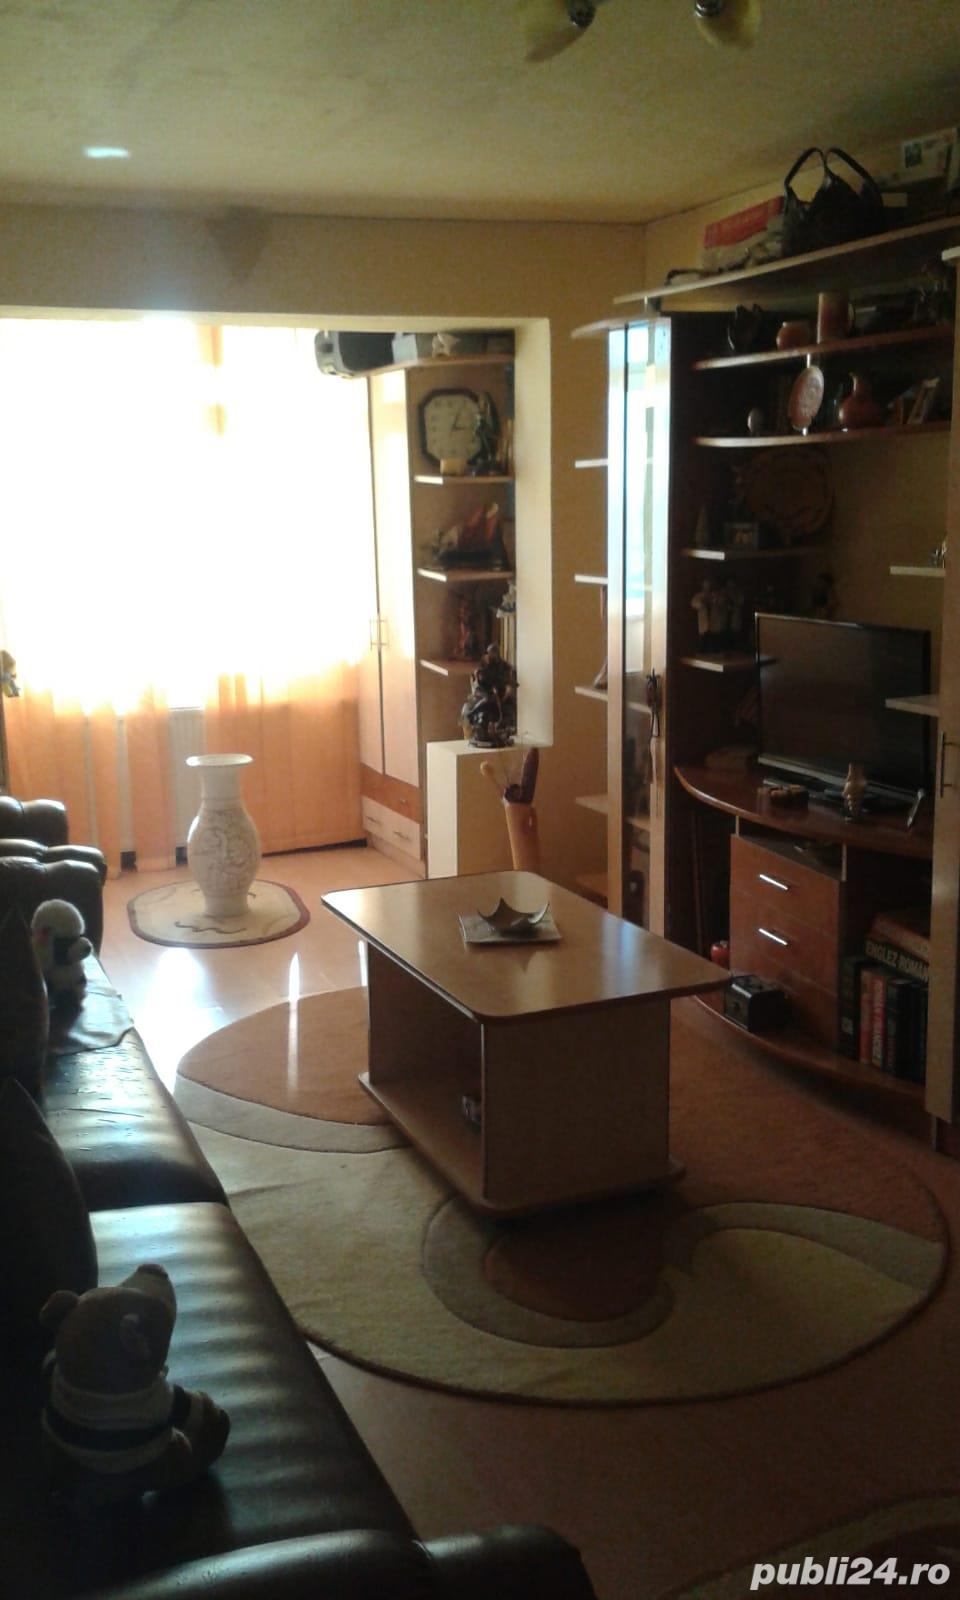 Vând apartament 2 camere, 57m2, ultracentral, mobilat, Slatina, Olt